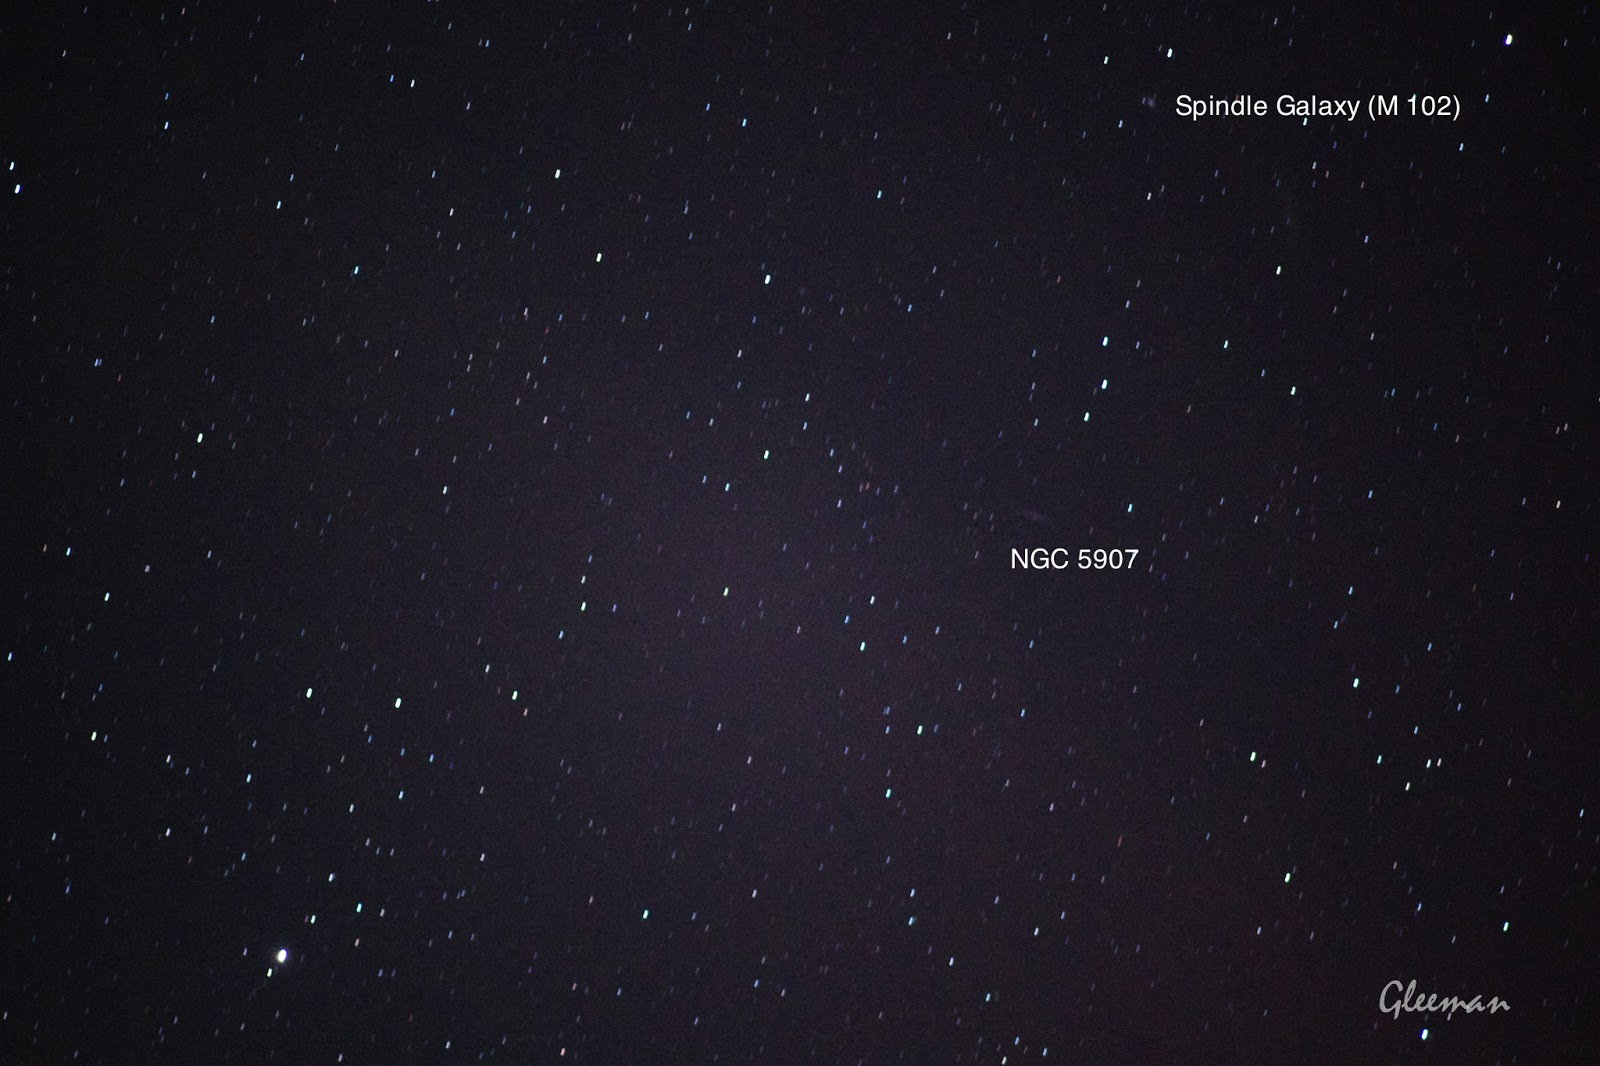 M102, NGC 5907 / Pentax  K5 + Pentax O-GPS1 + DA*200